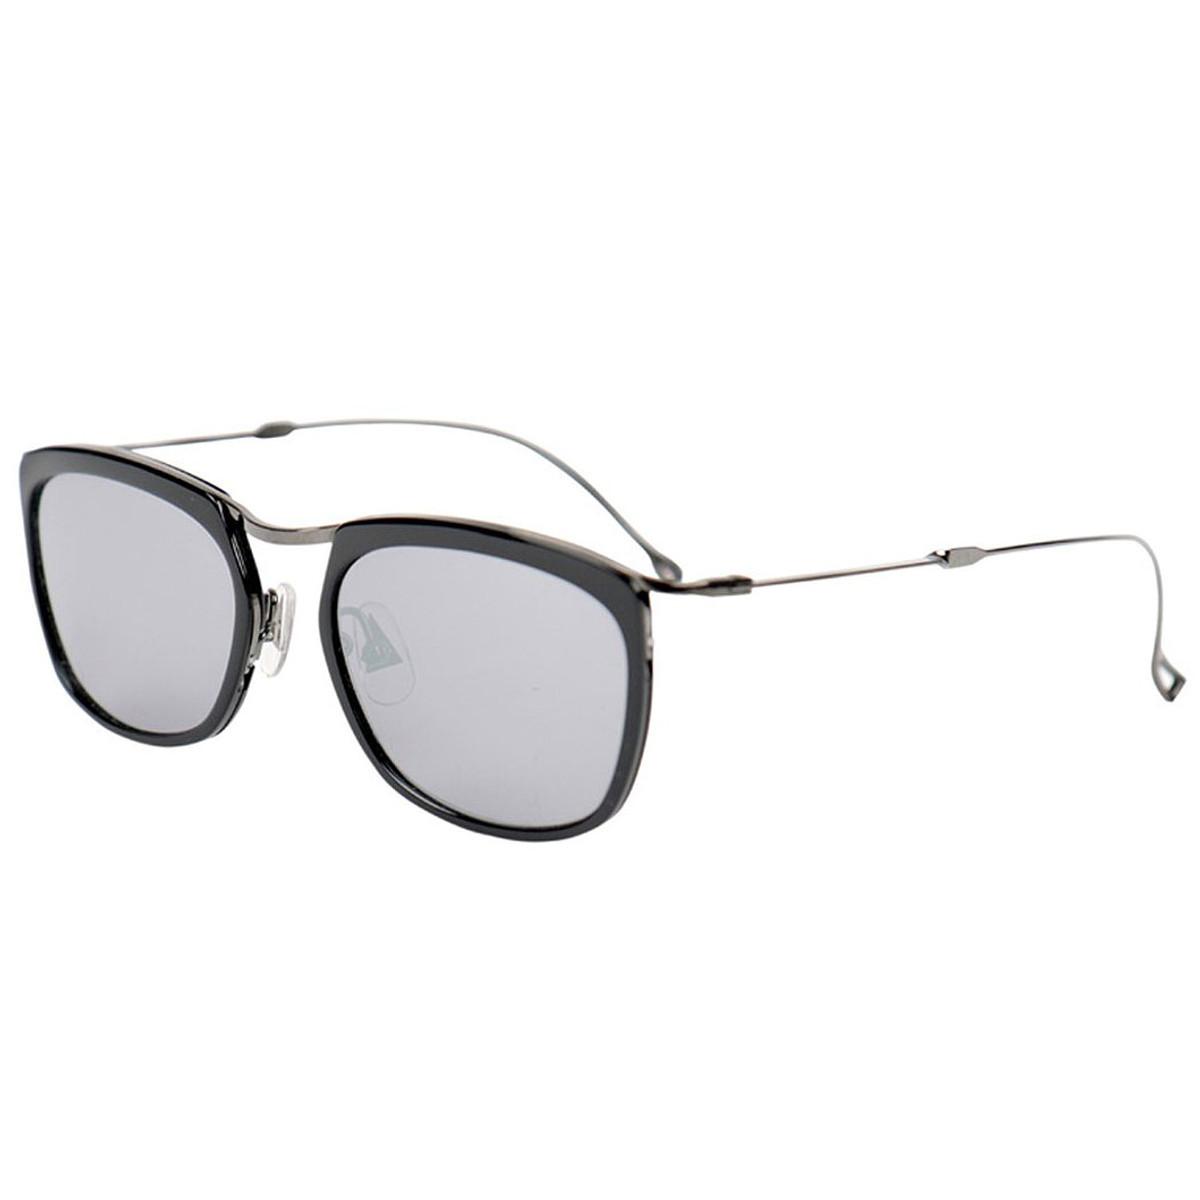 81f5401374b8 Issey Miyake Eyes Black Wellington Sunglasses